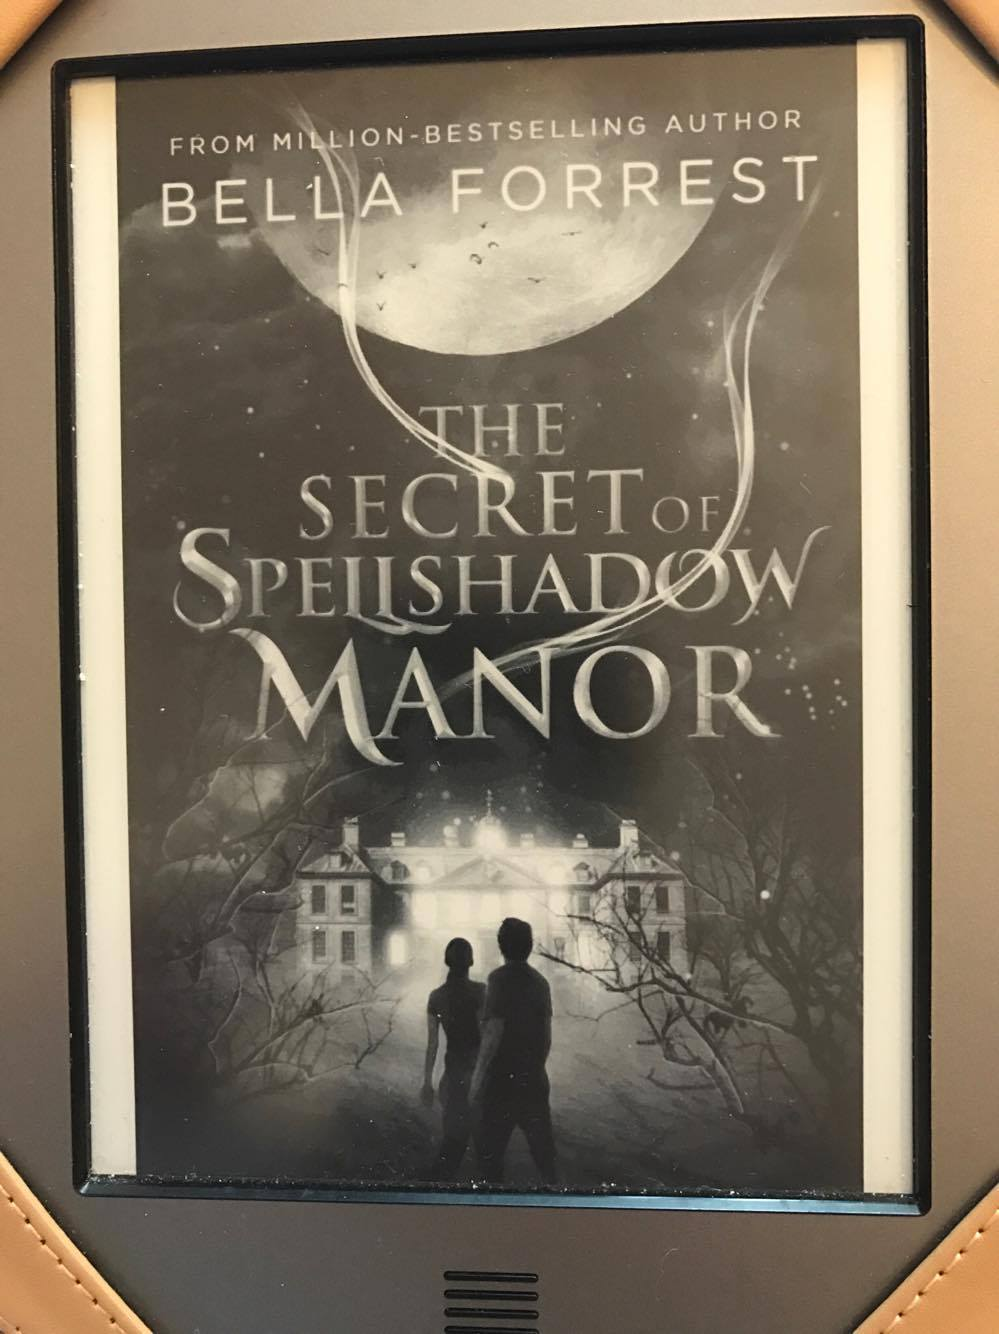 The Secret of Spellshadow Manor – Bella Forrest